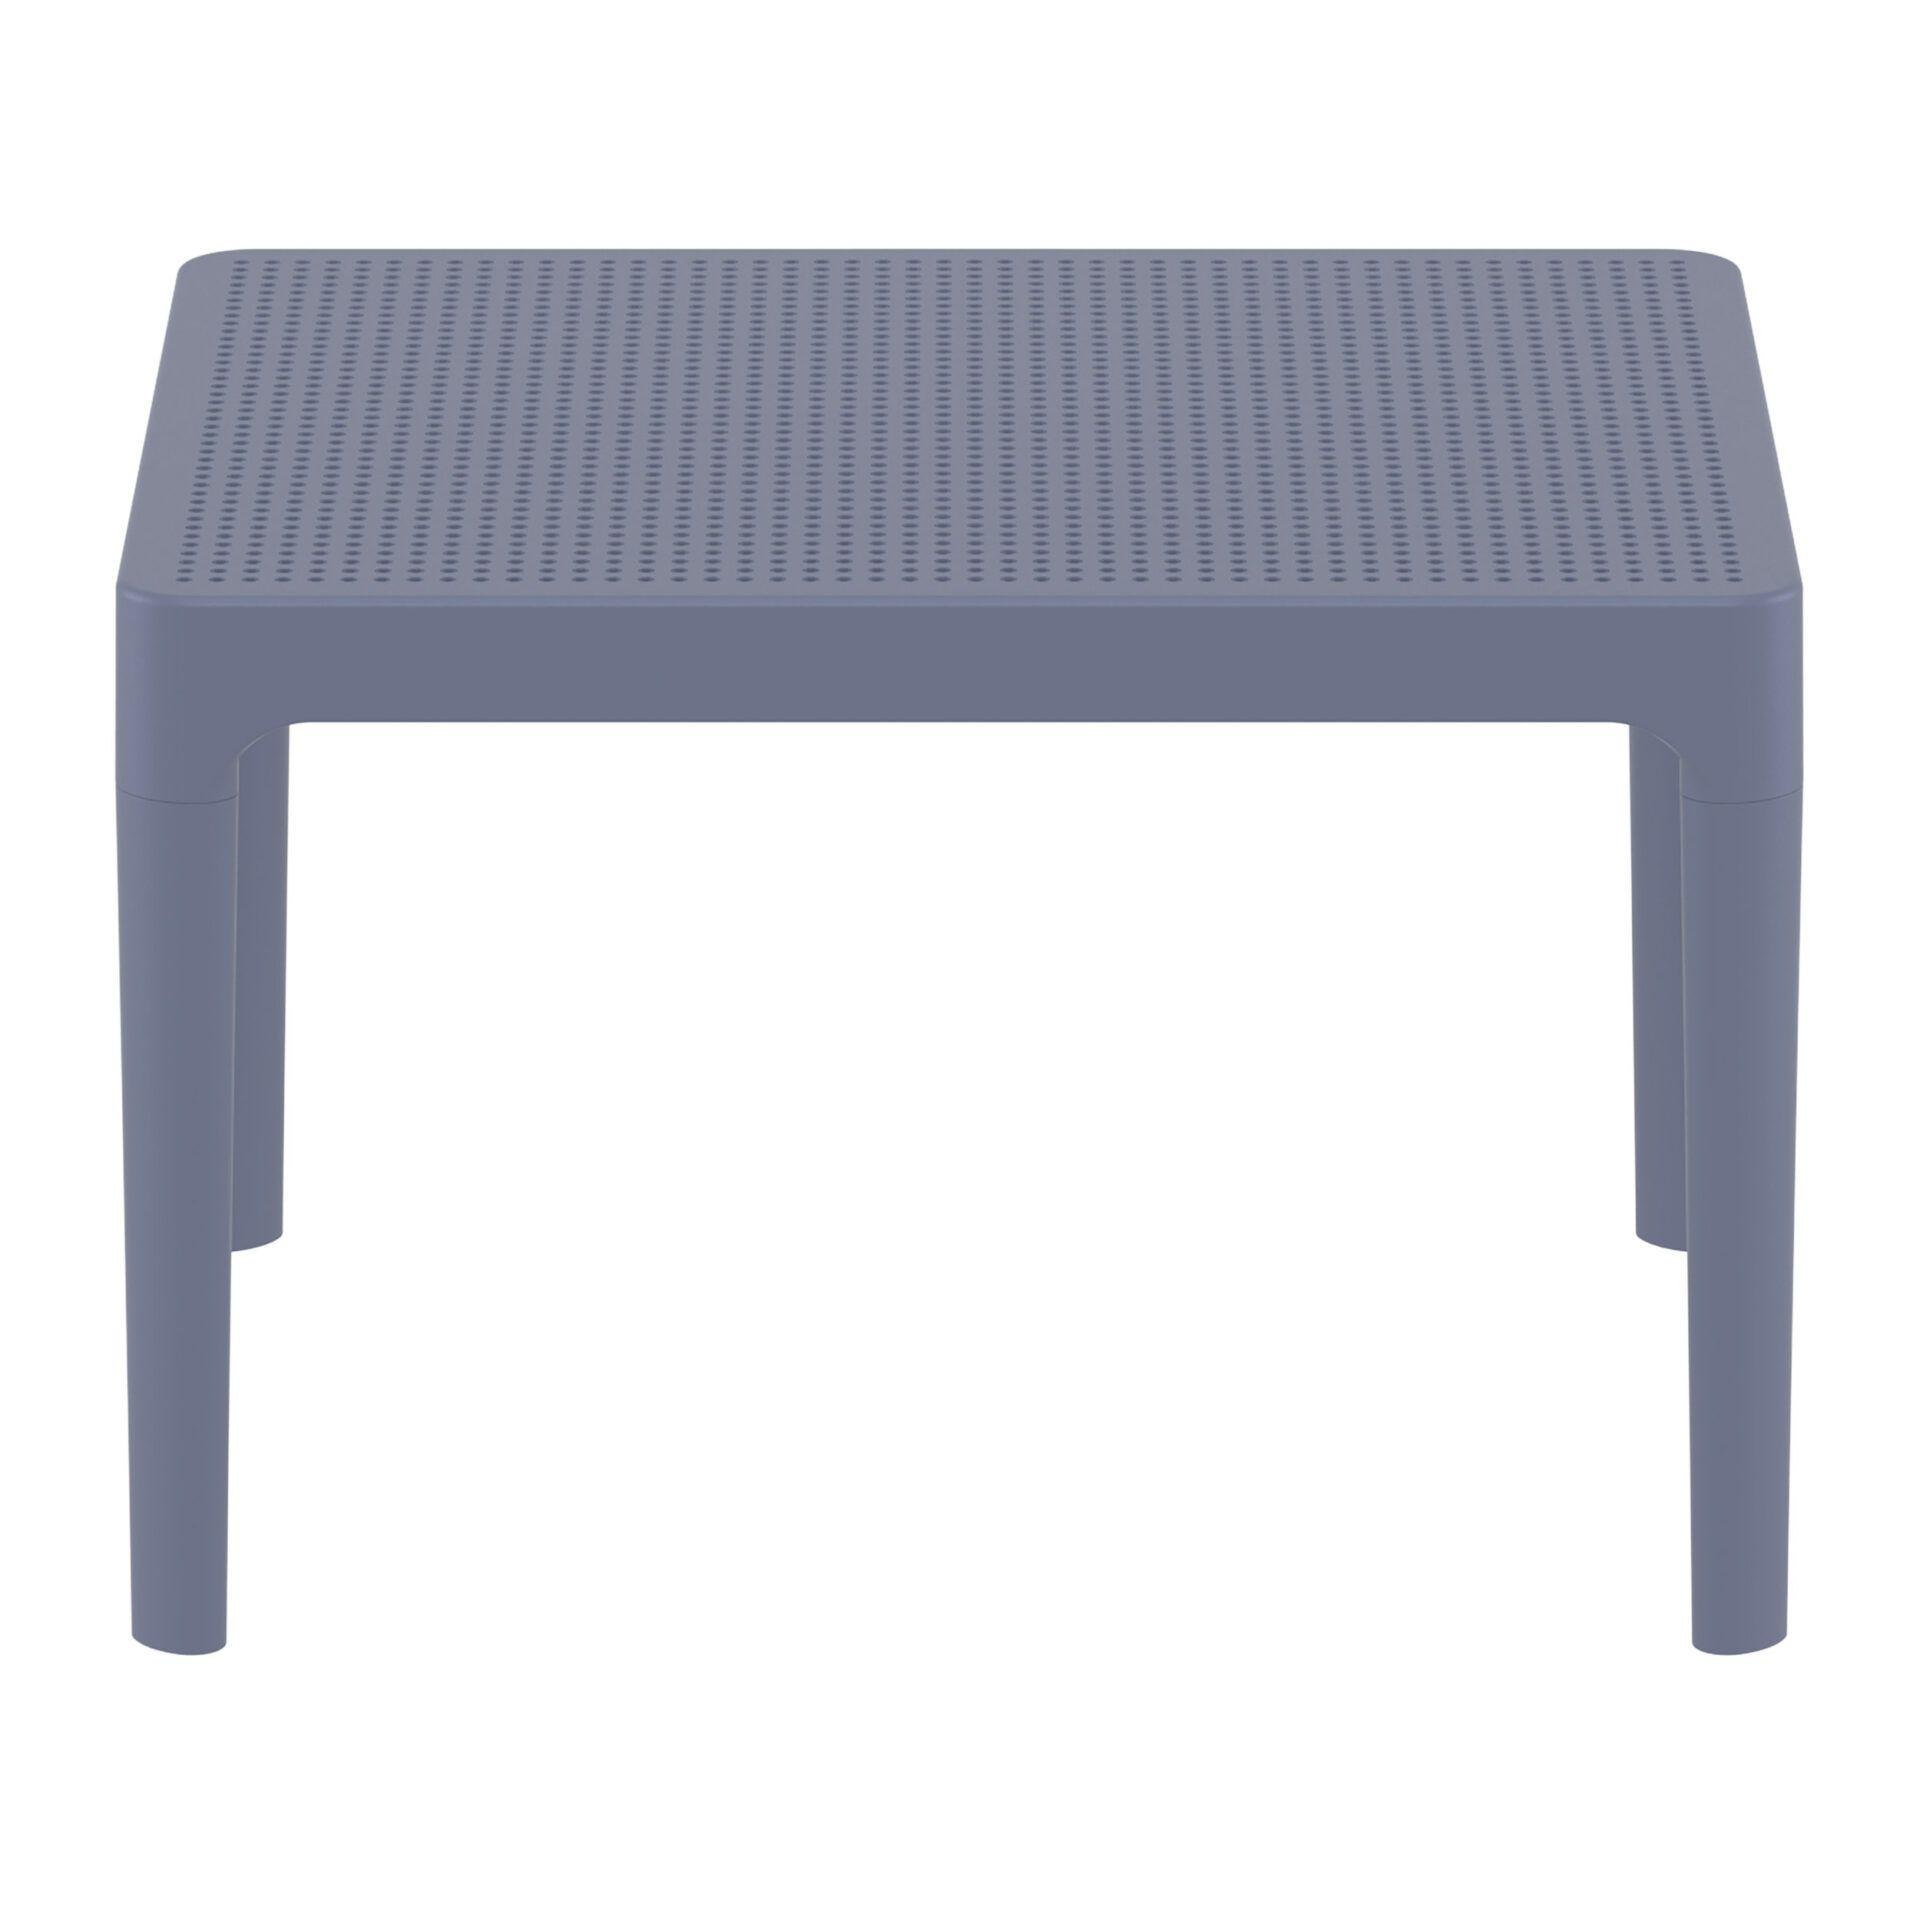 polypropylene outdoor sky side table darkgrey long edge